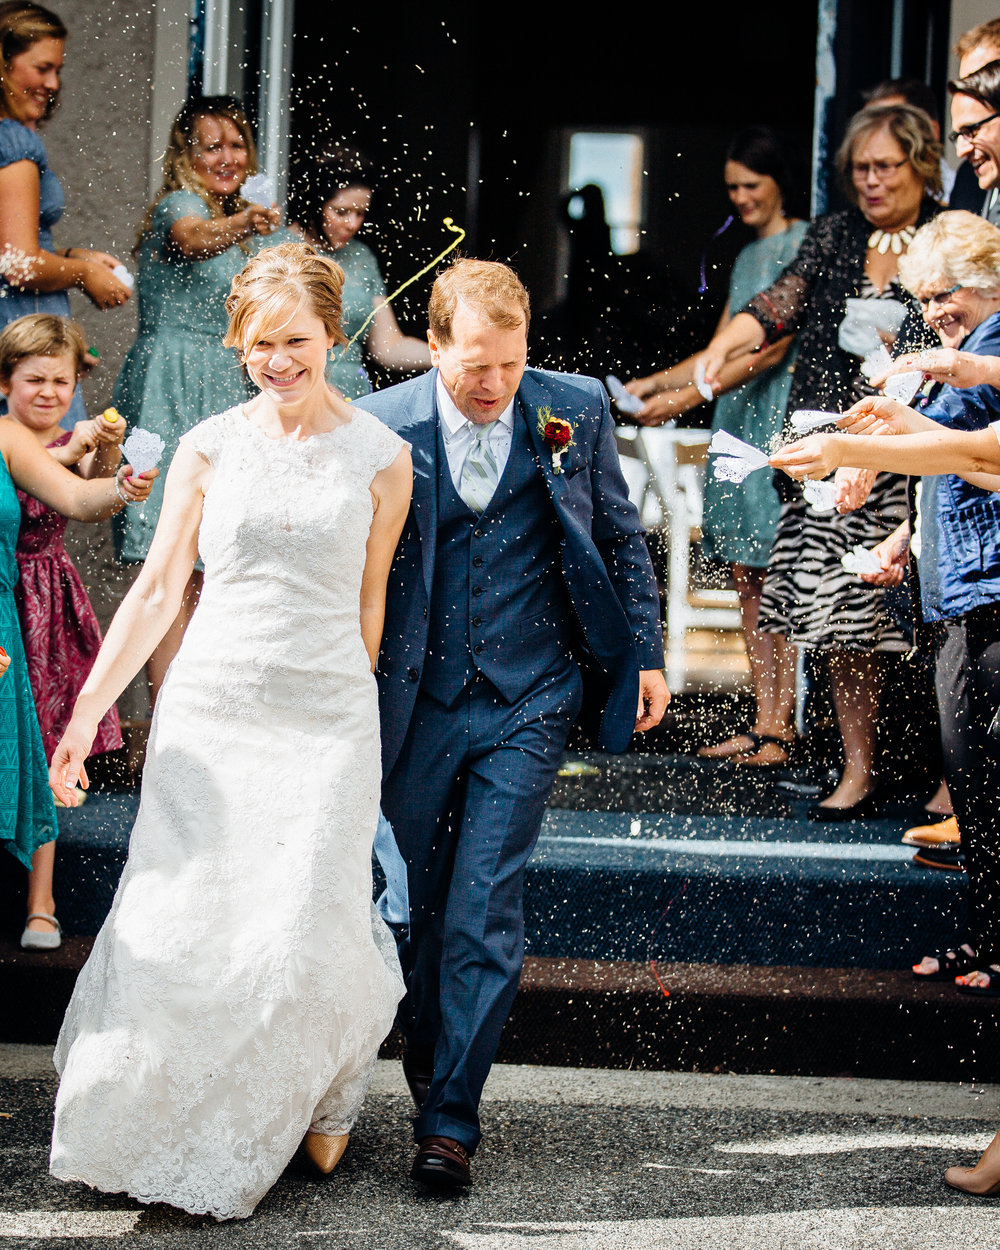 AndrewBrownPhotography-Weddings-63.jpg